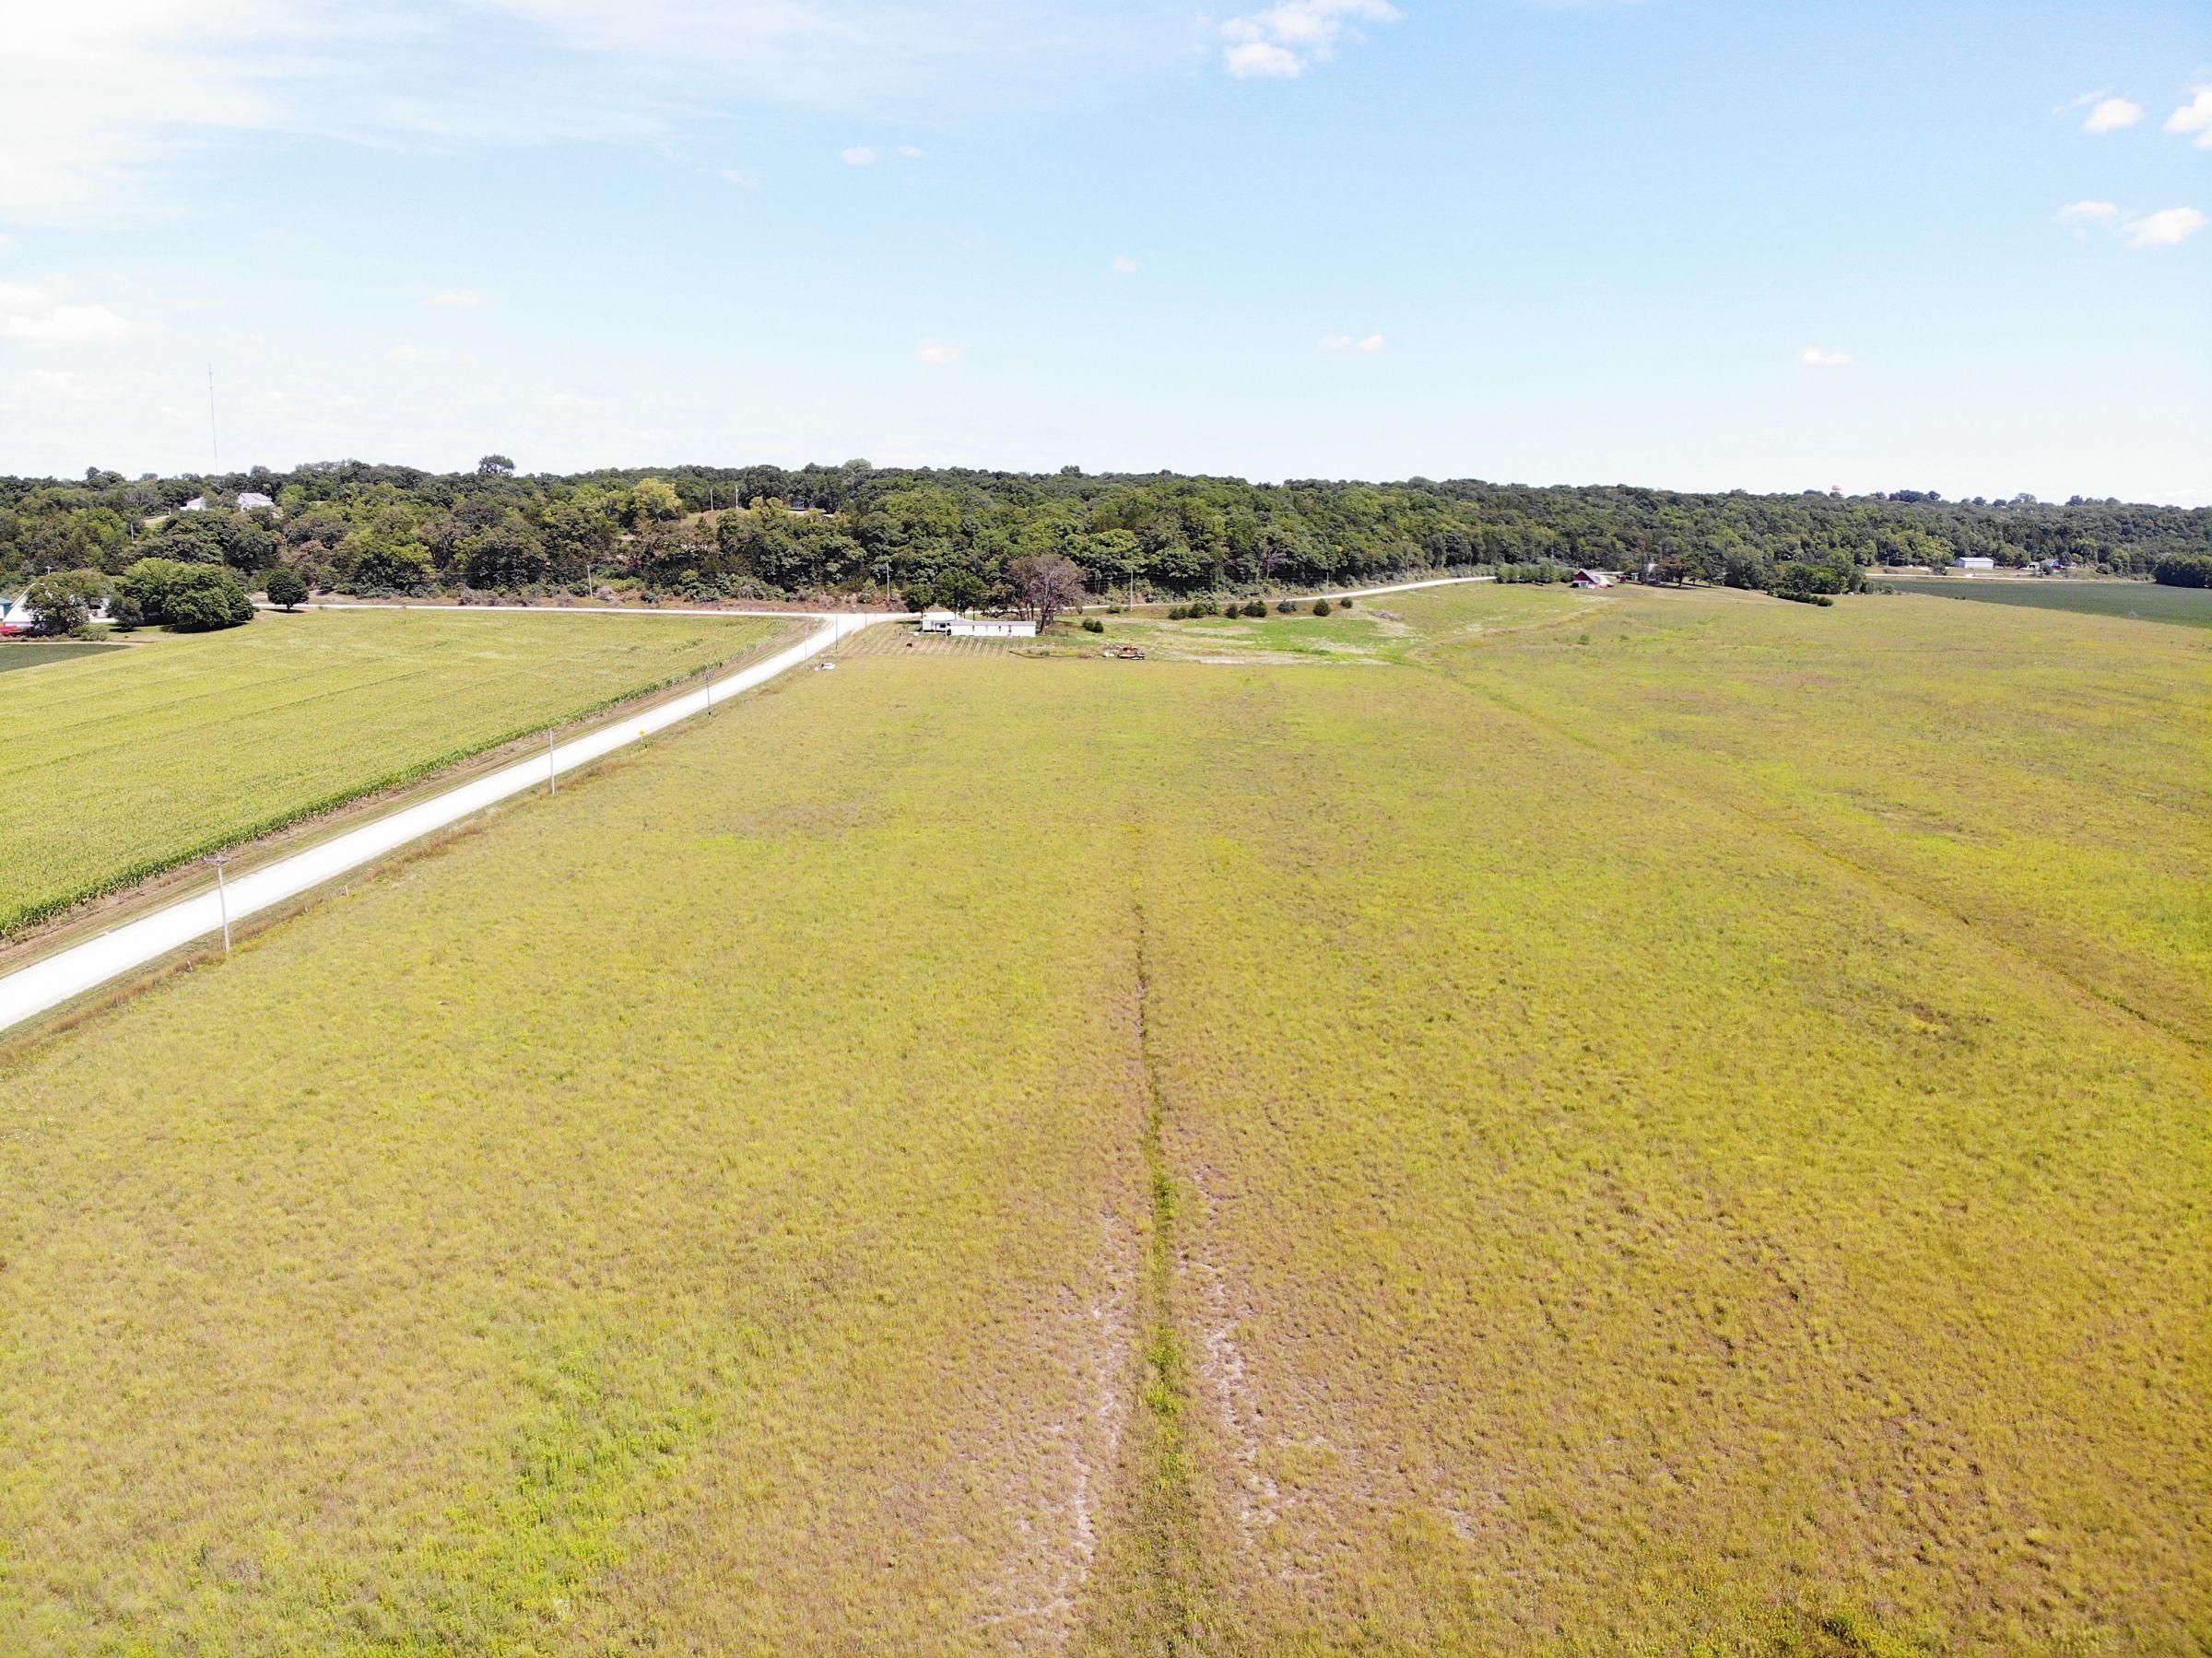 land-warren-county-iowa-84-acres-listing-number-15103-8-2020-08-05-144427.jpg